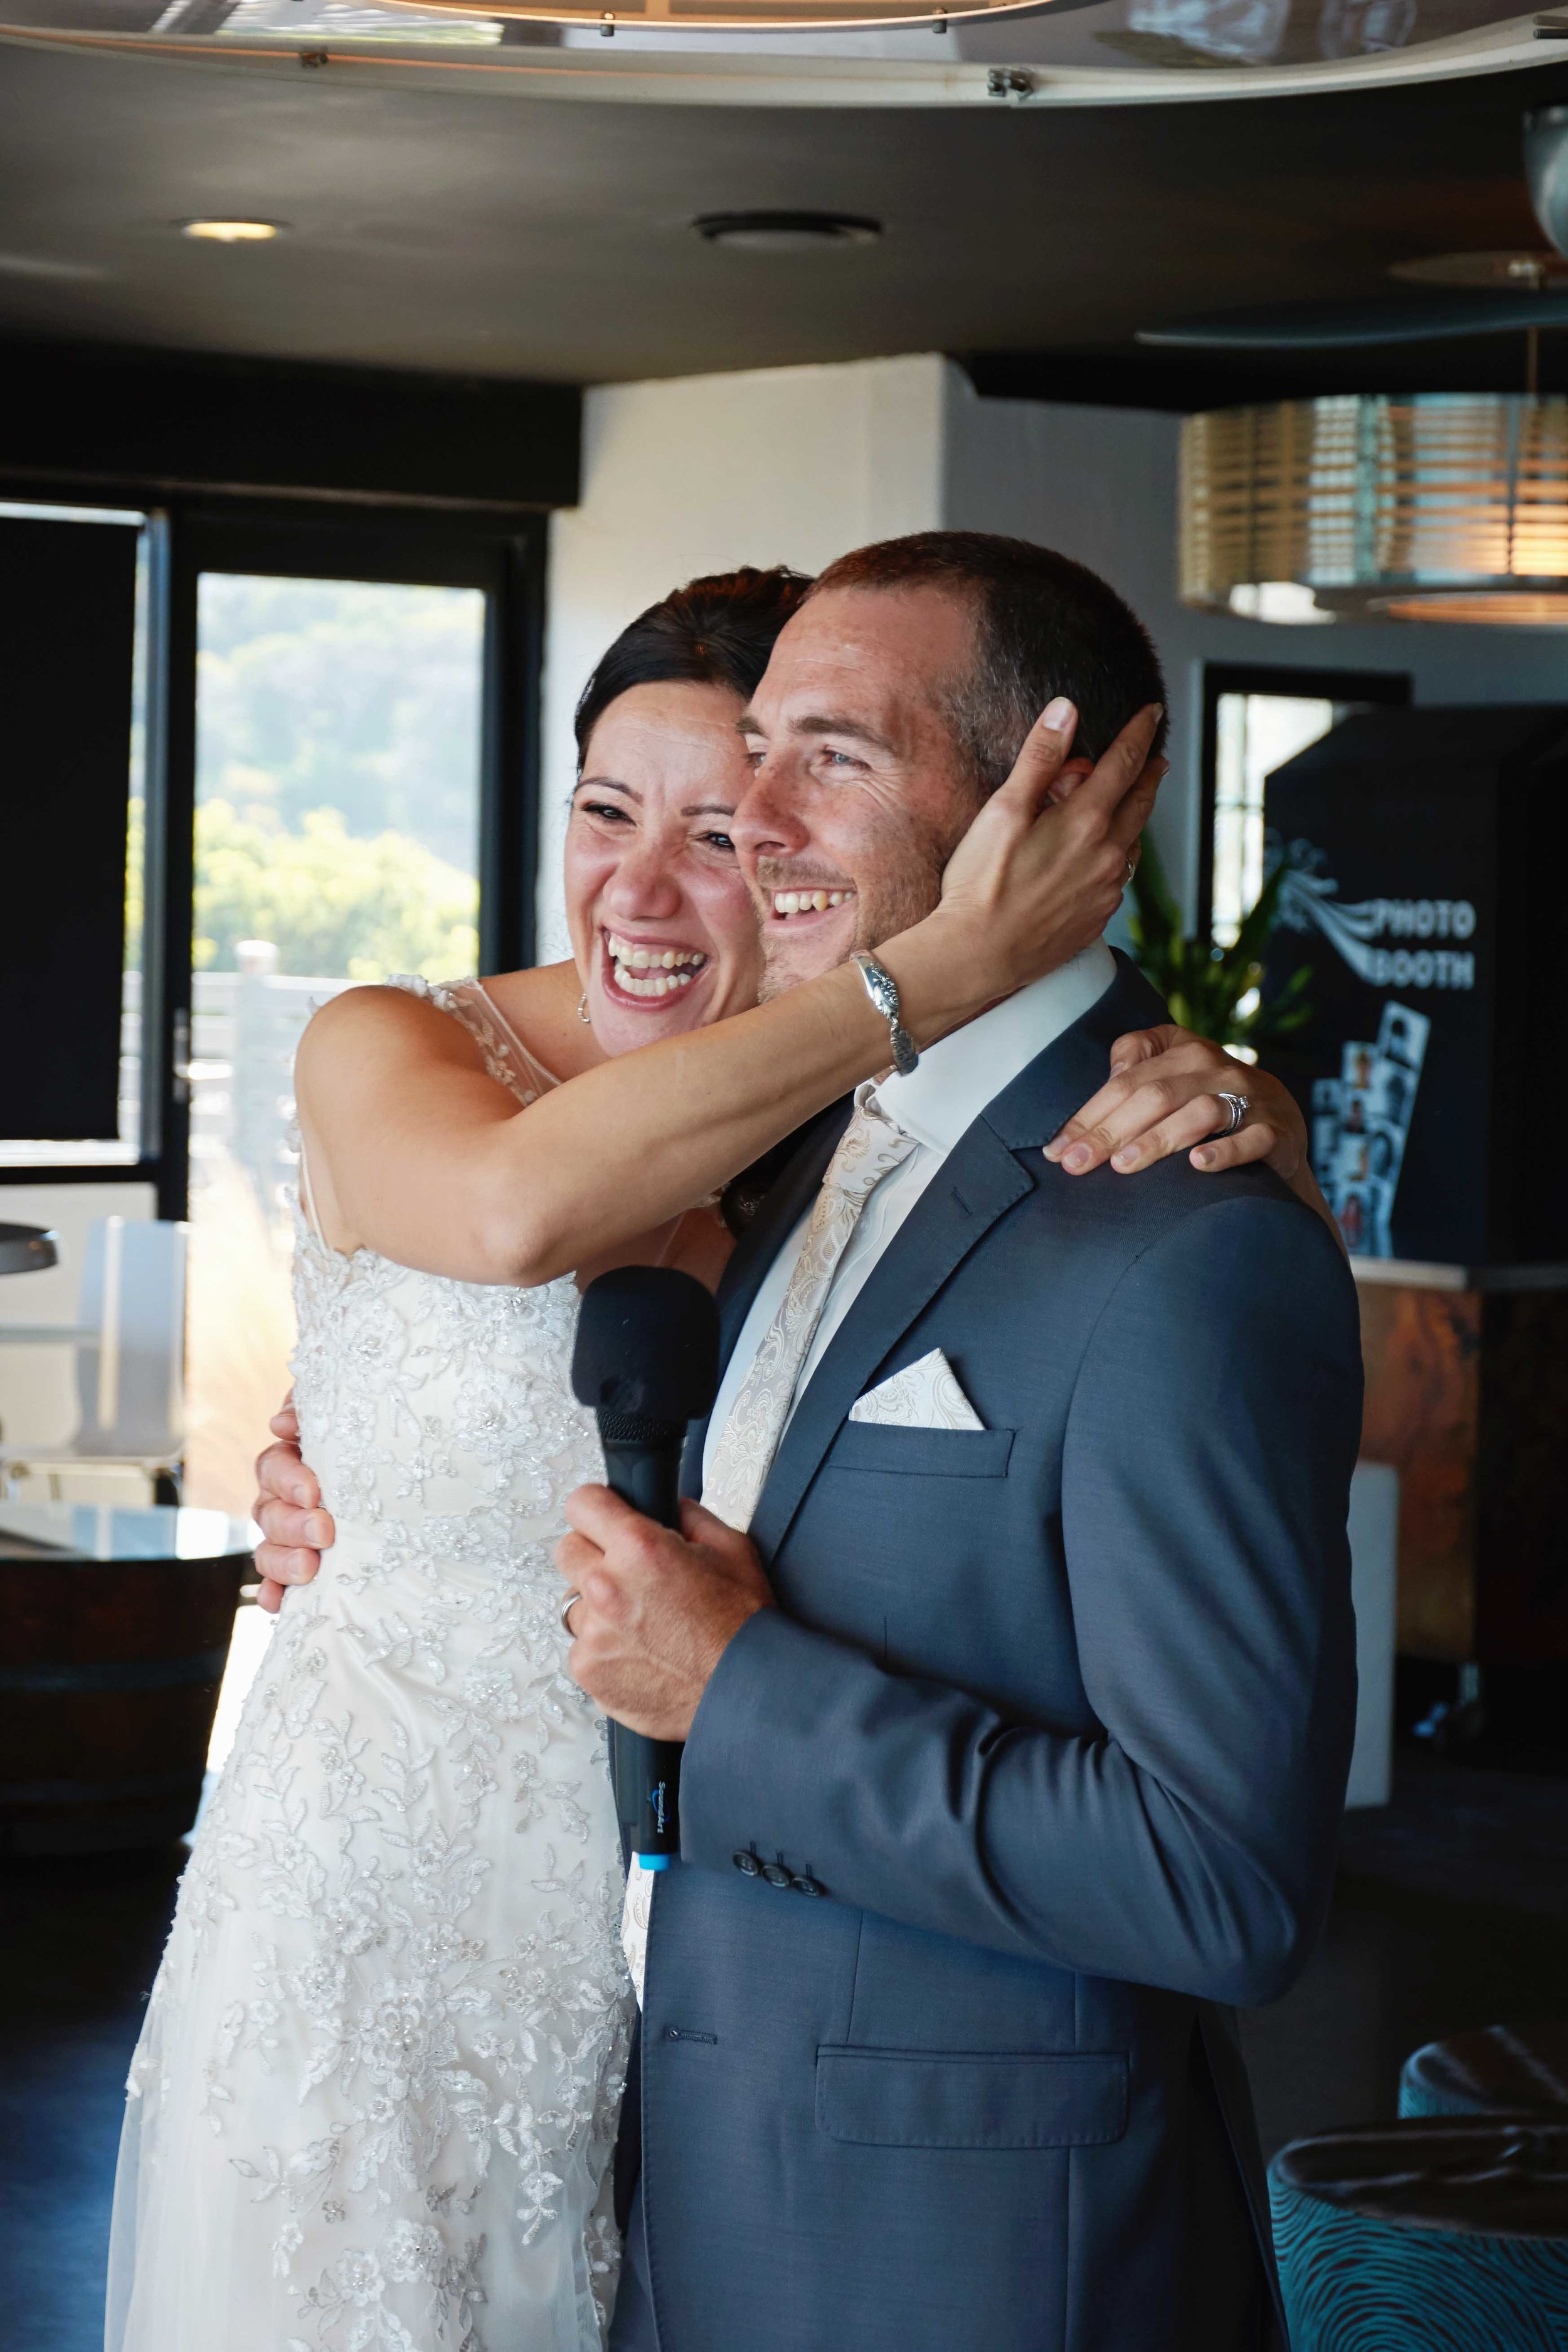 sorrento-wedding-photography-all-smiles-marissa-jade-photography-95.jpg